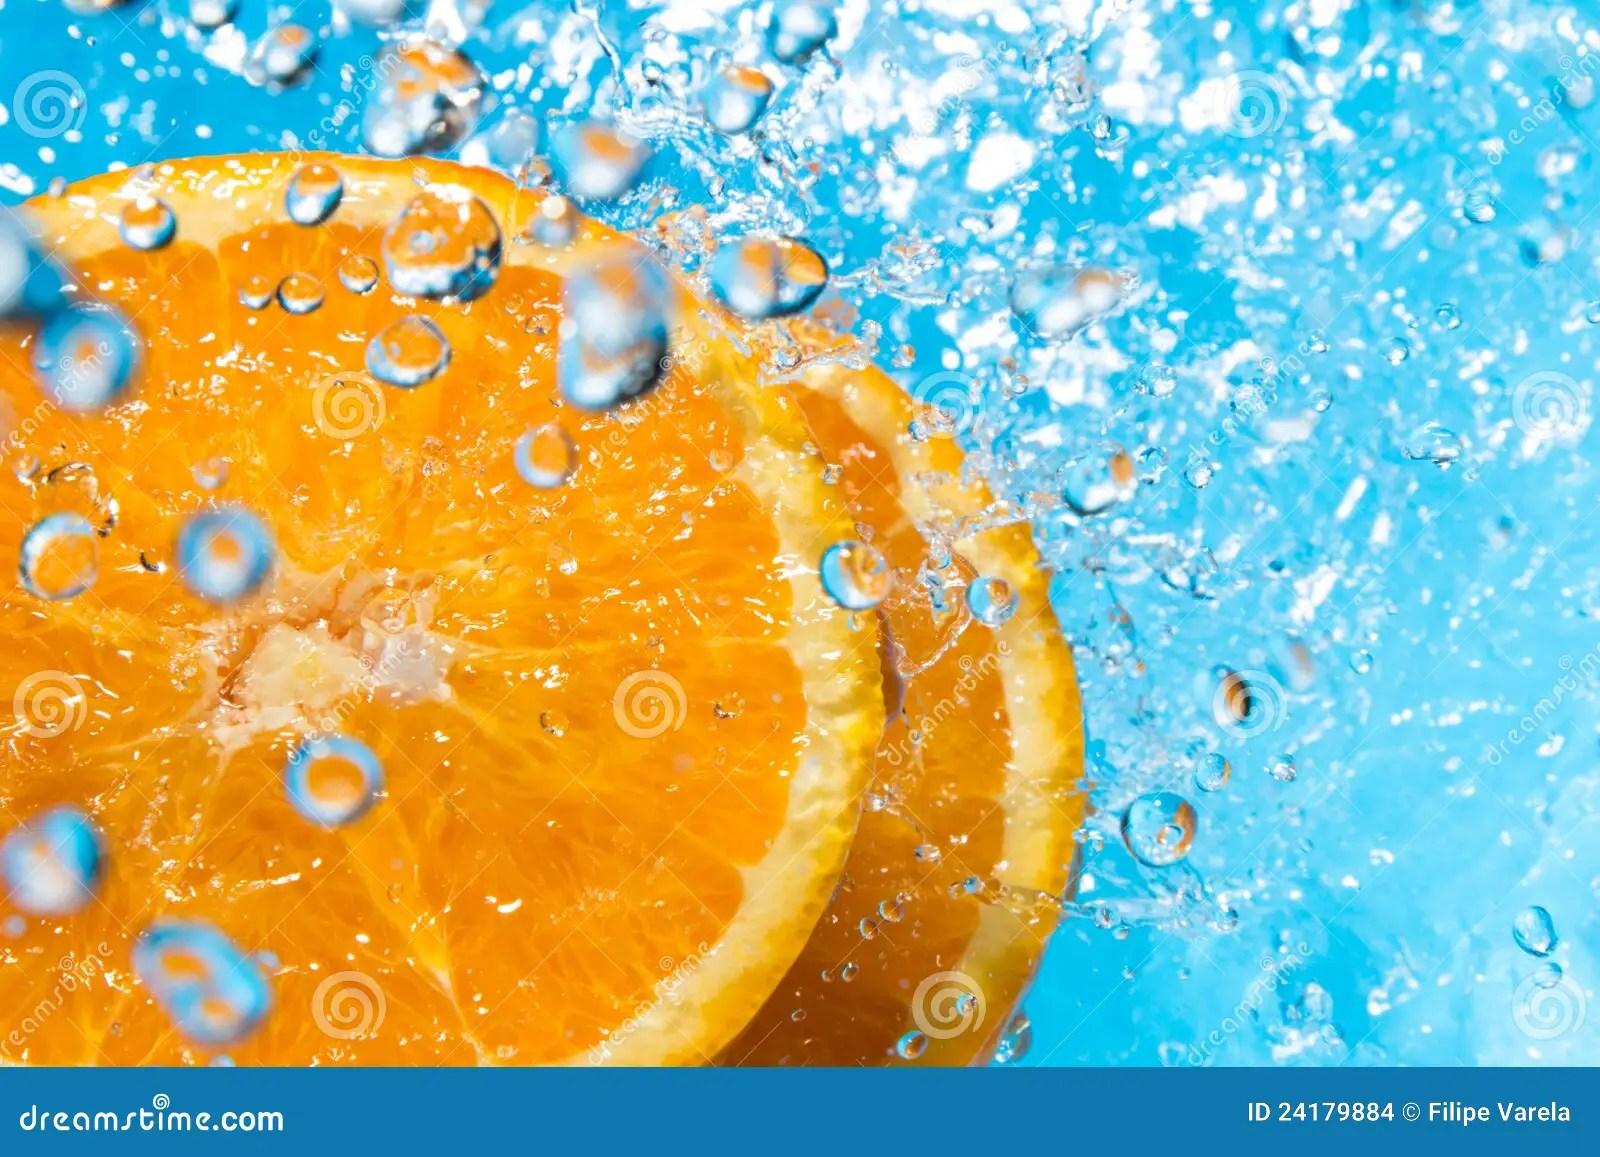 Falling Water Wallpaper Orange Splash In Water Top View Stock Images Image